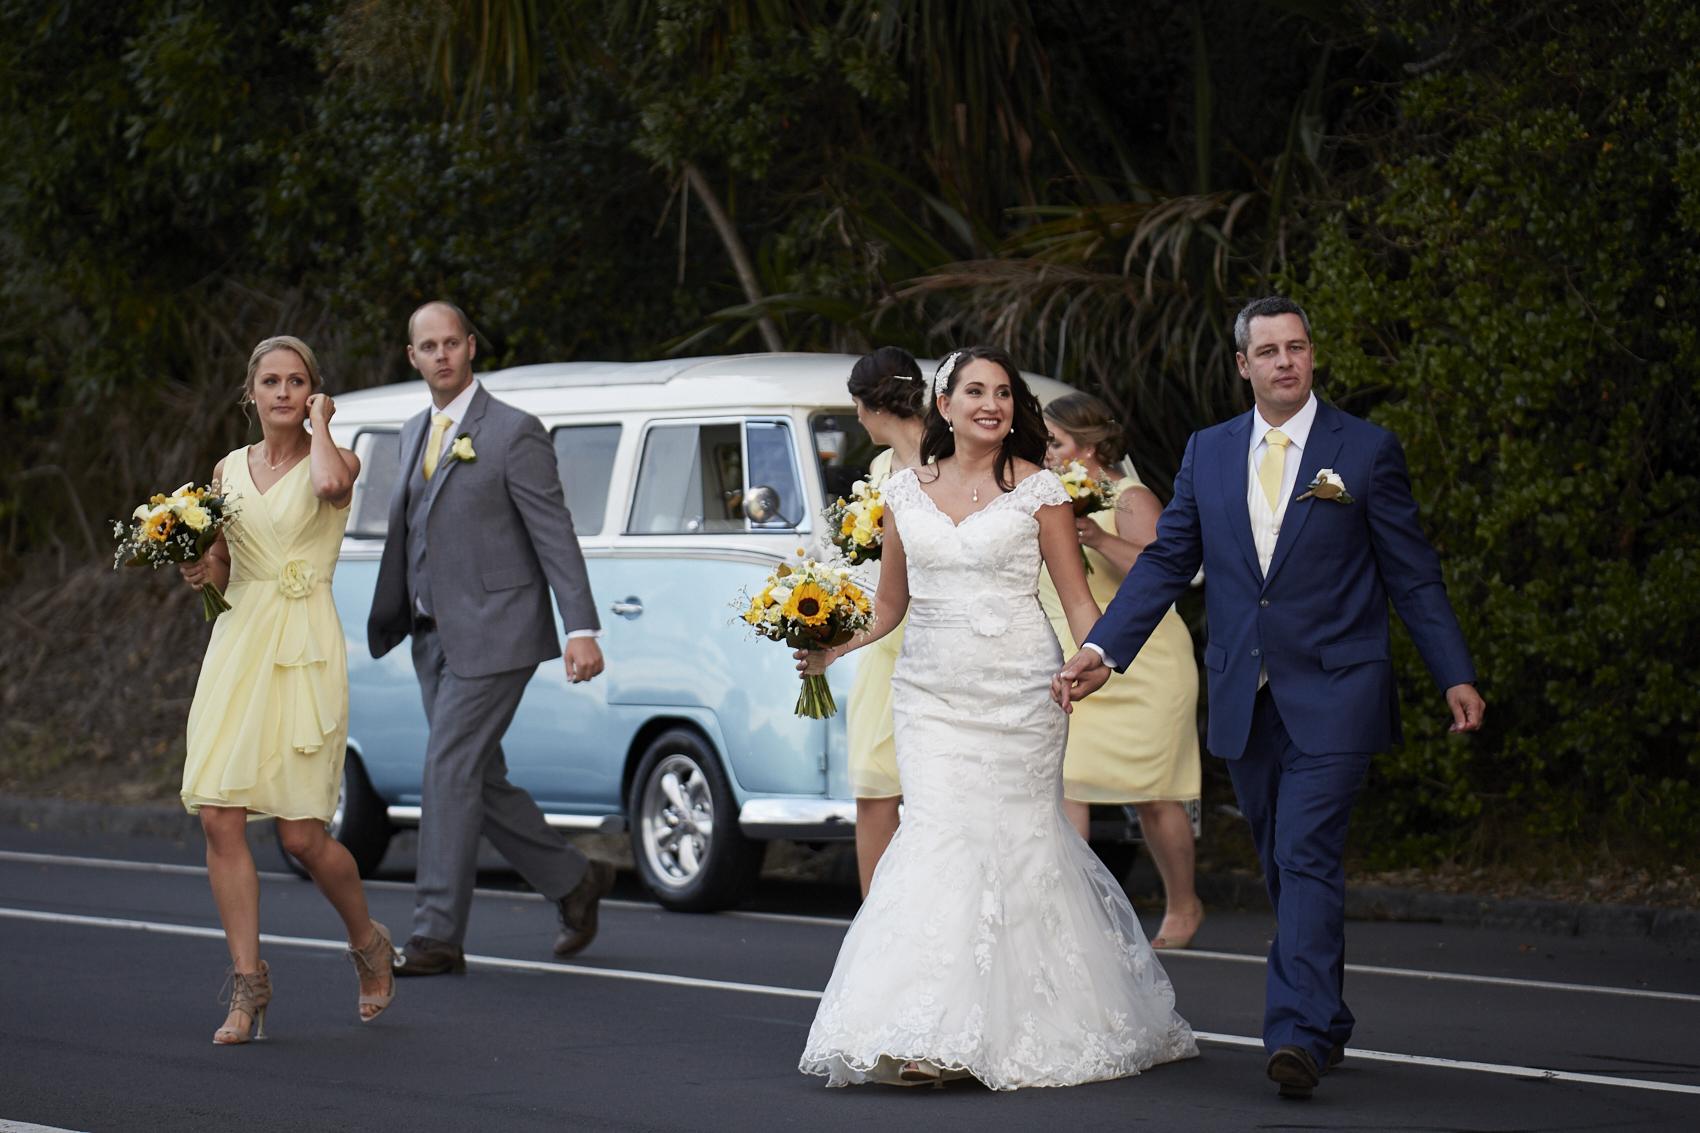 newlyweds crossing road